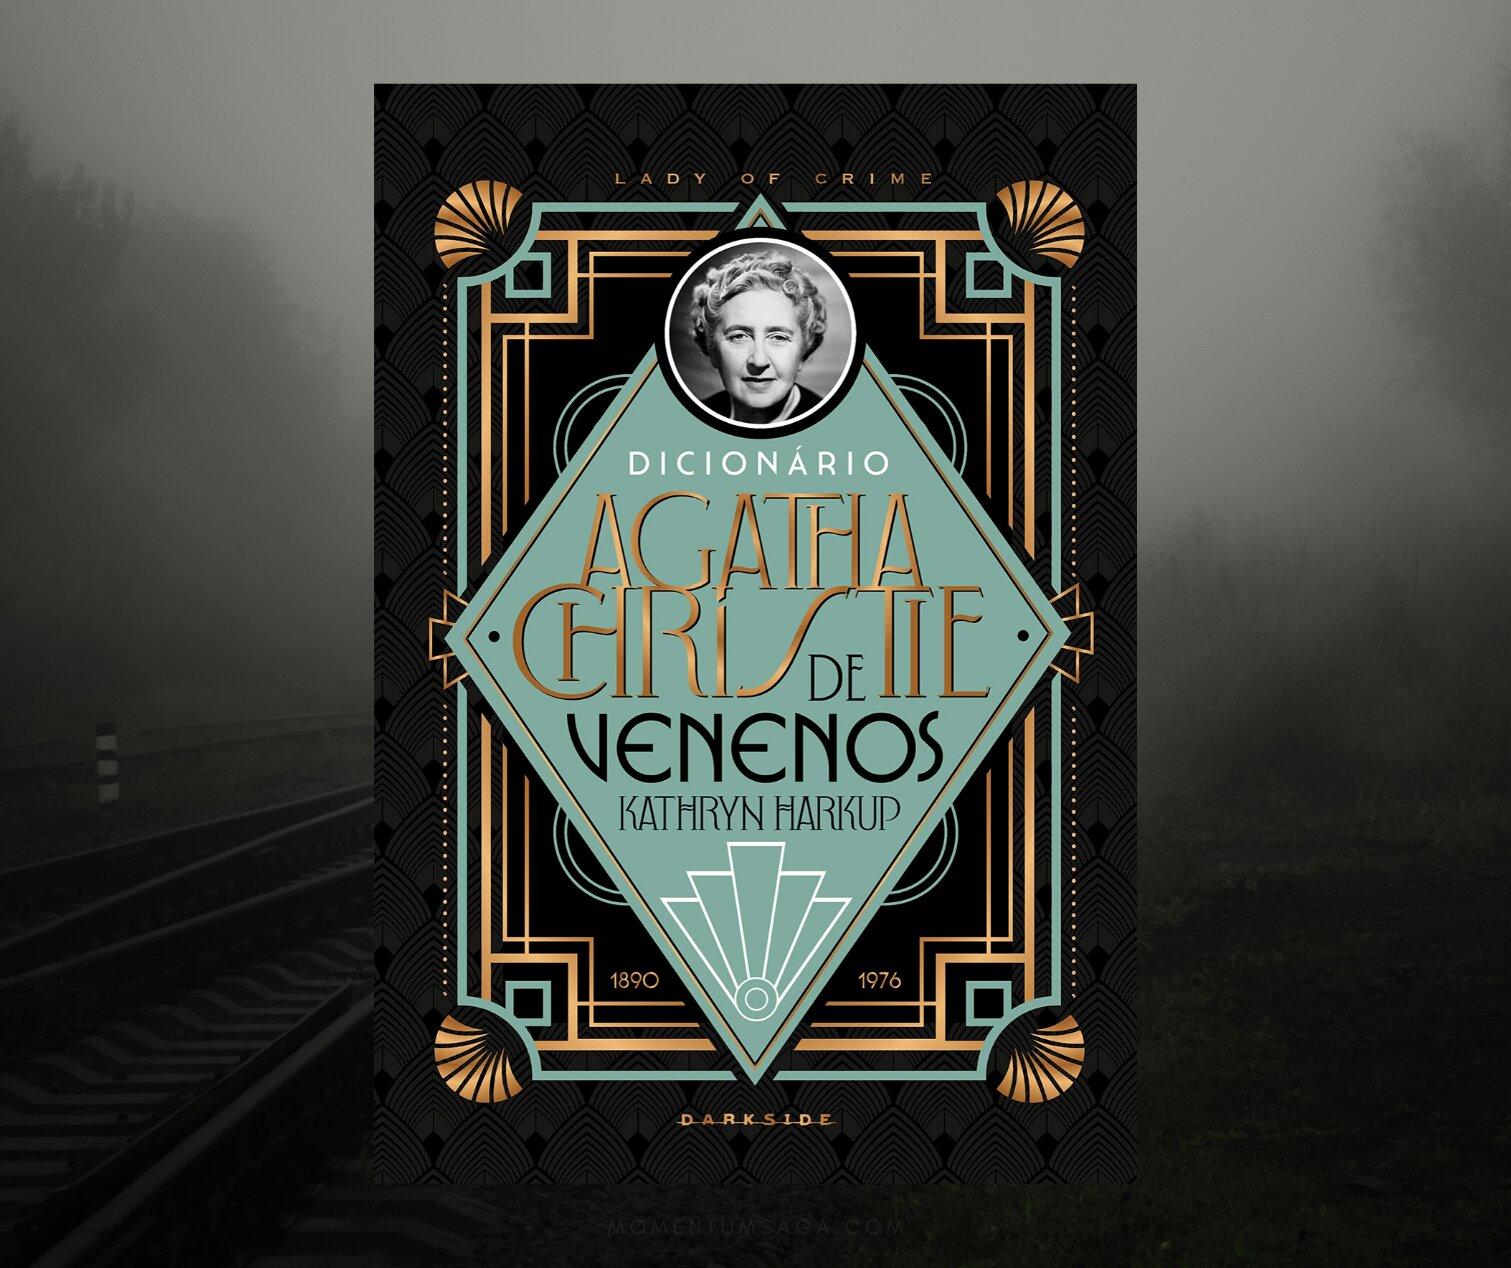 Resenha: Dicionário Agatha Christie de Venenos, de Kathryn Harkup